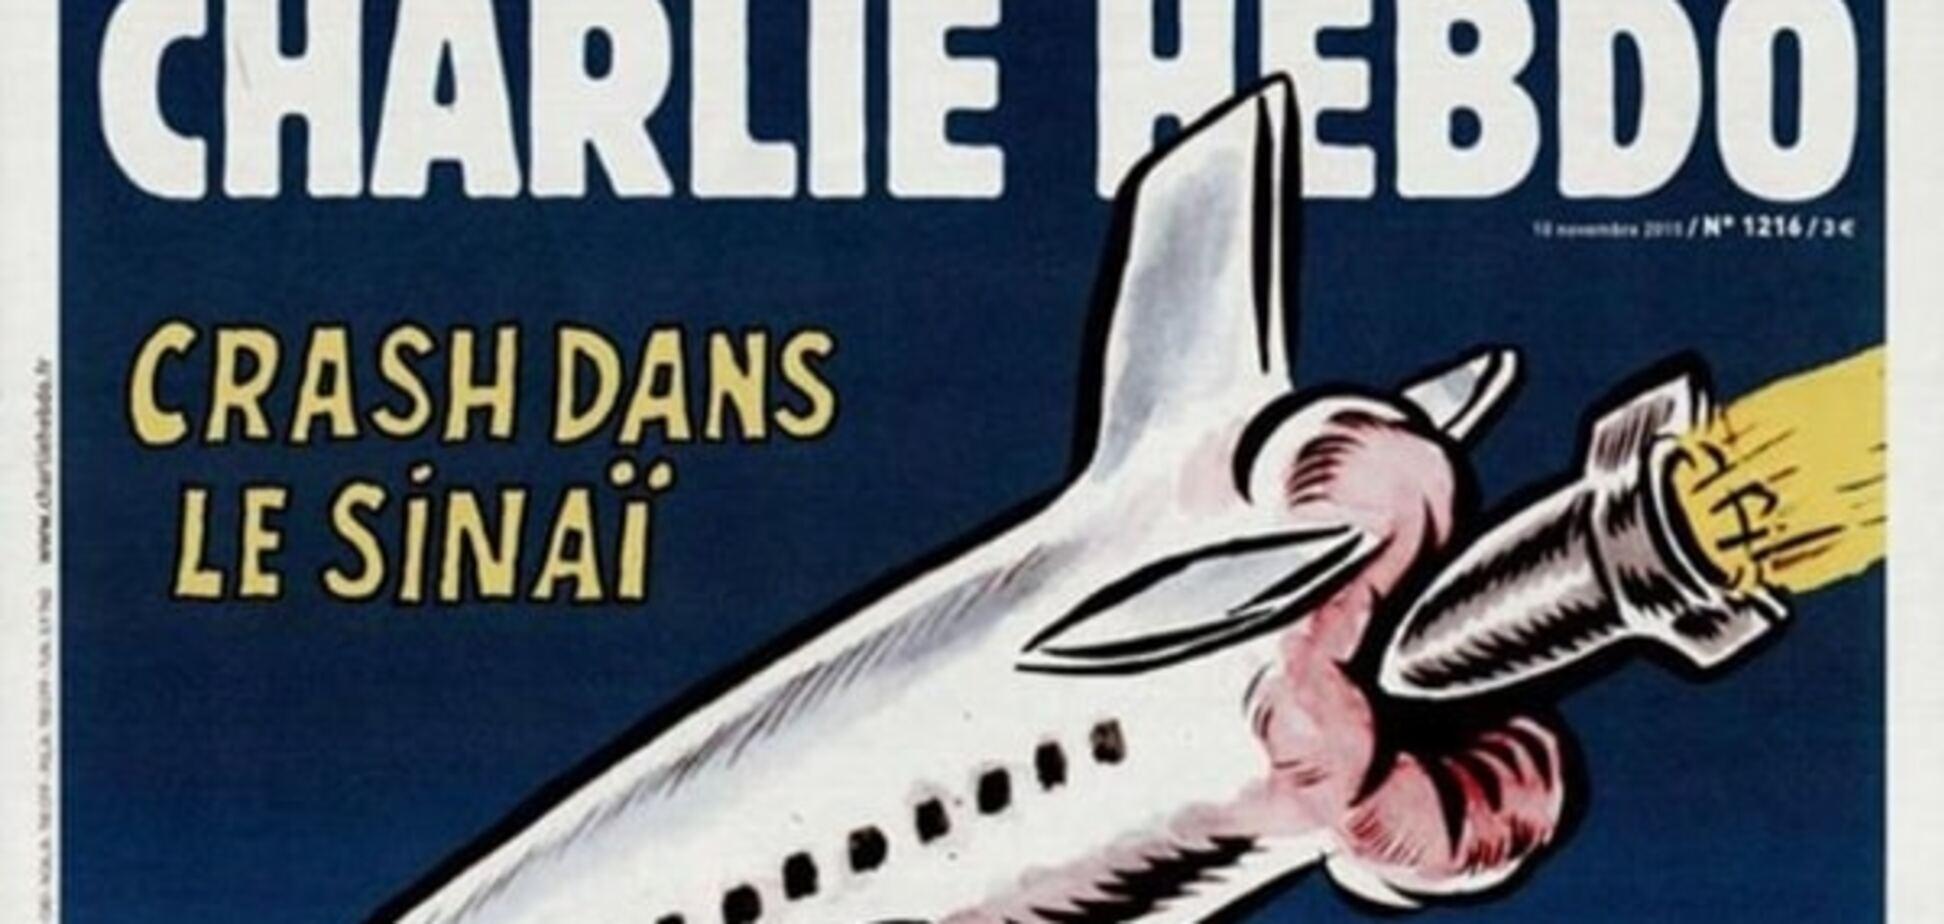 'Наконец-то порно': Charlie Hebdo опубликовал новую карикатуру на крушение A321